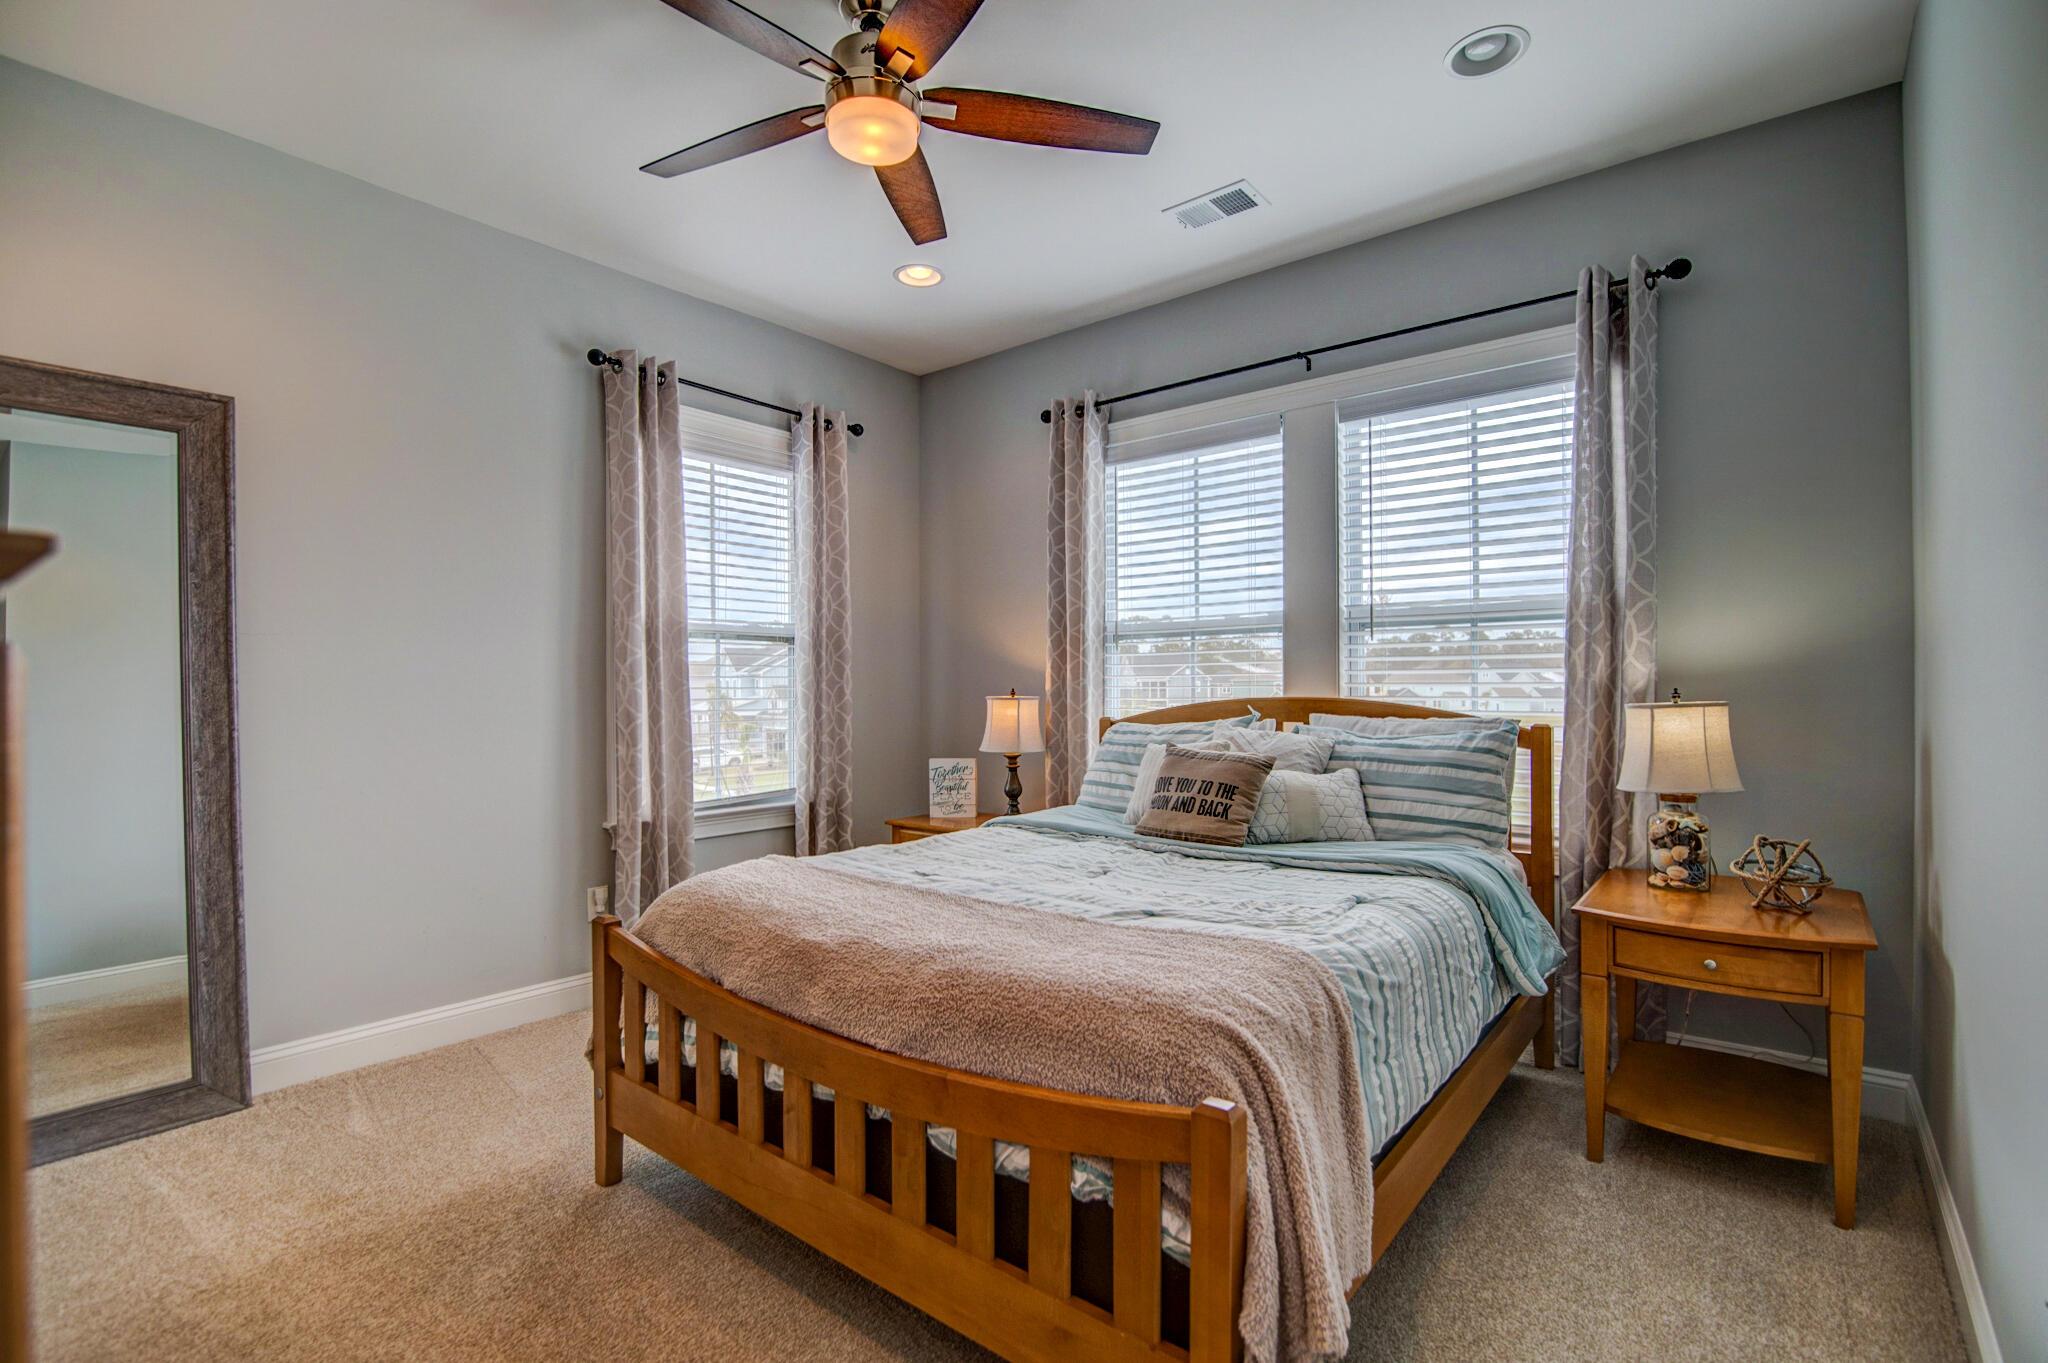 Carolina Park Homes For Sale - 3634 Spindrift, Mount Pleasant, SC - 10